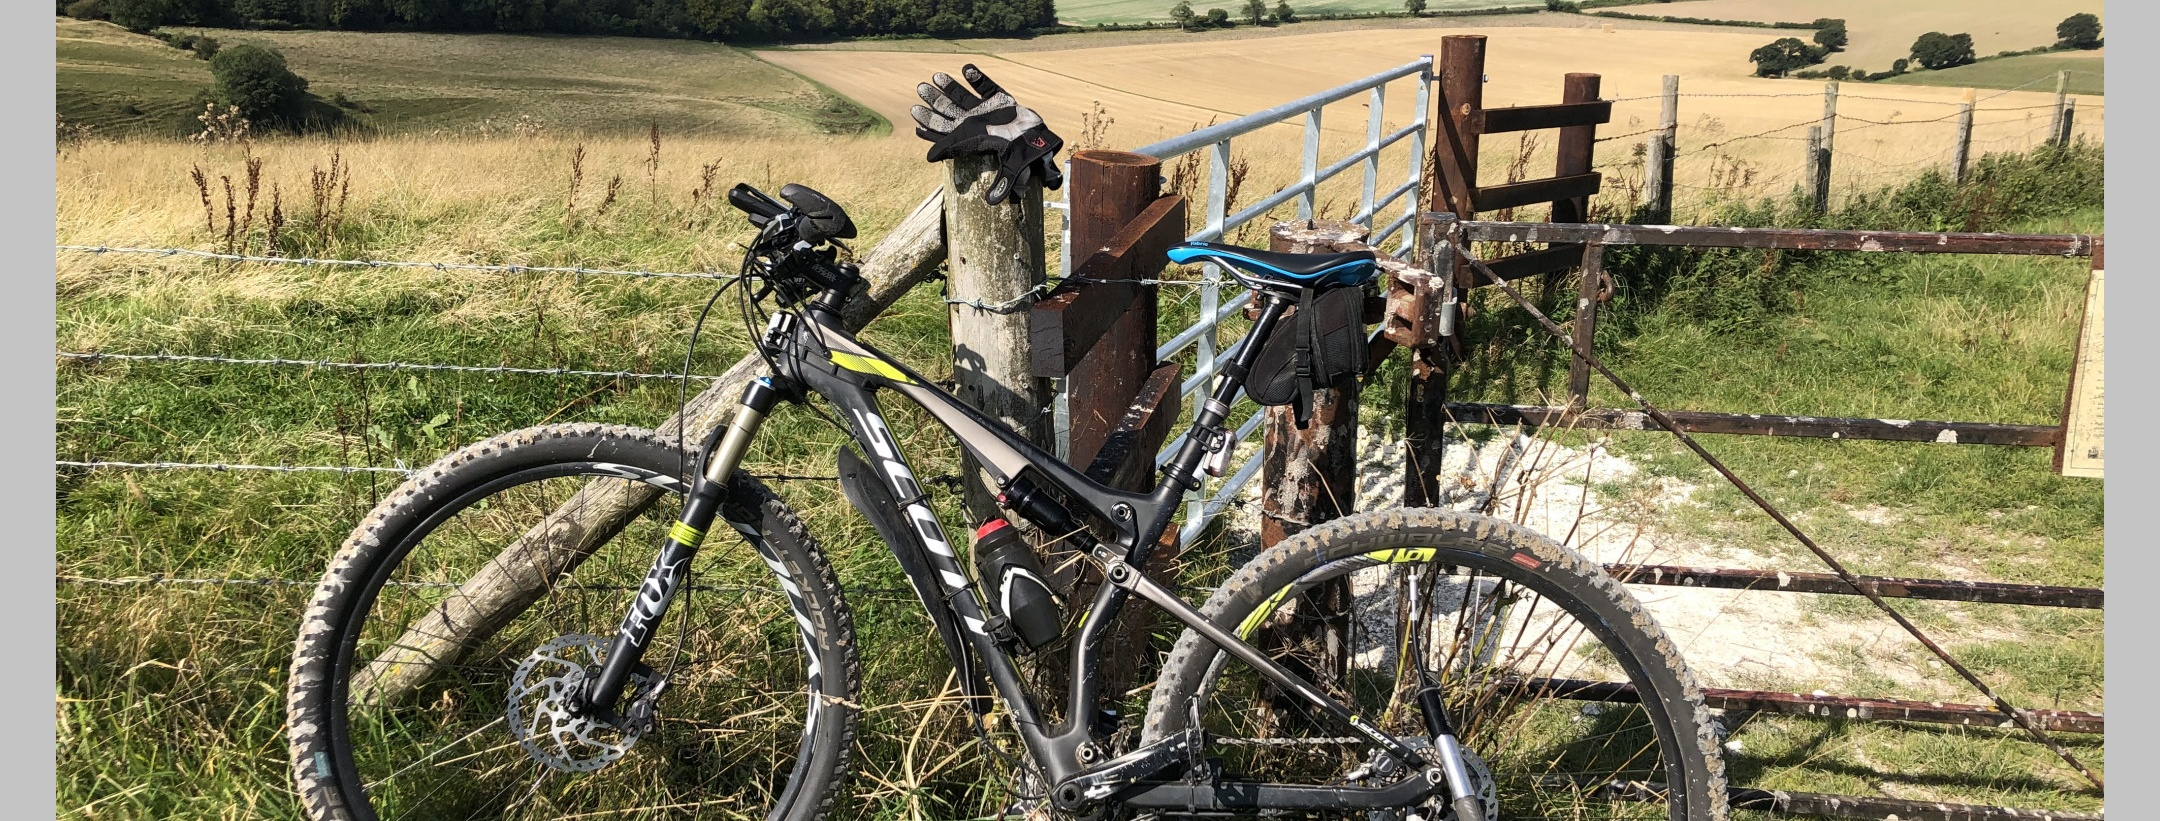 Stranded on a desolate Knighton Down in Salisbury Plain